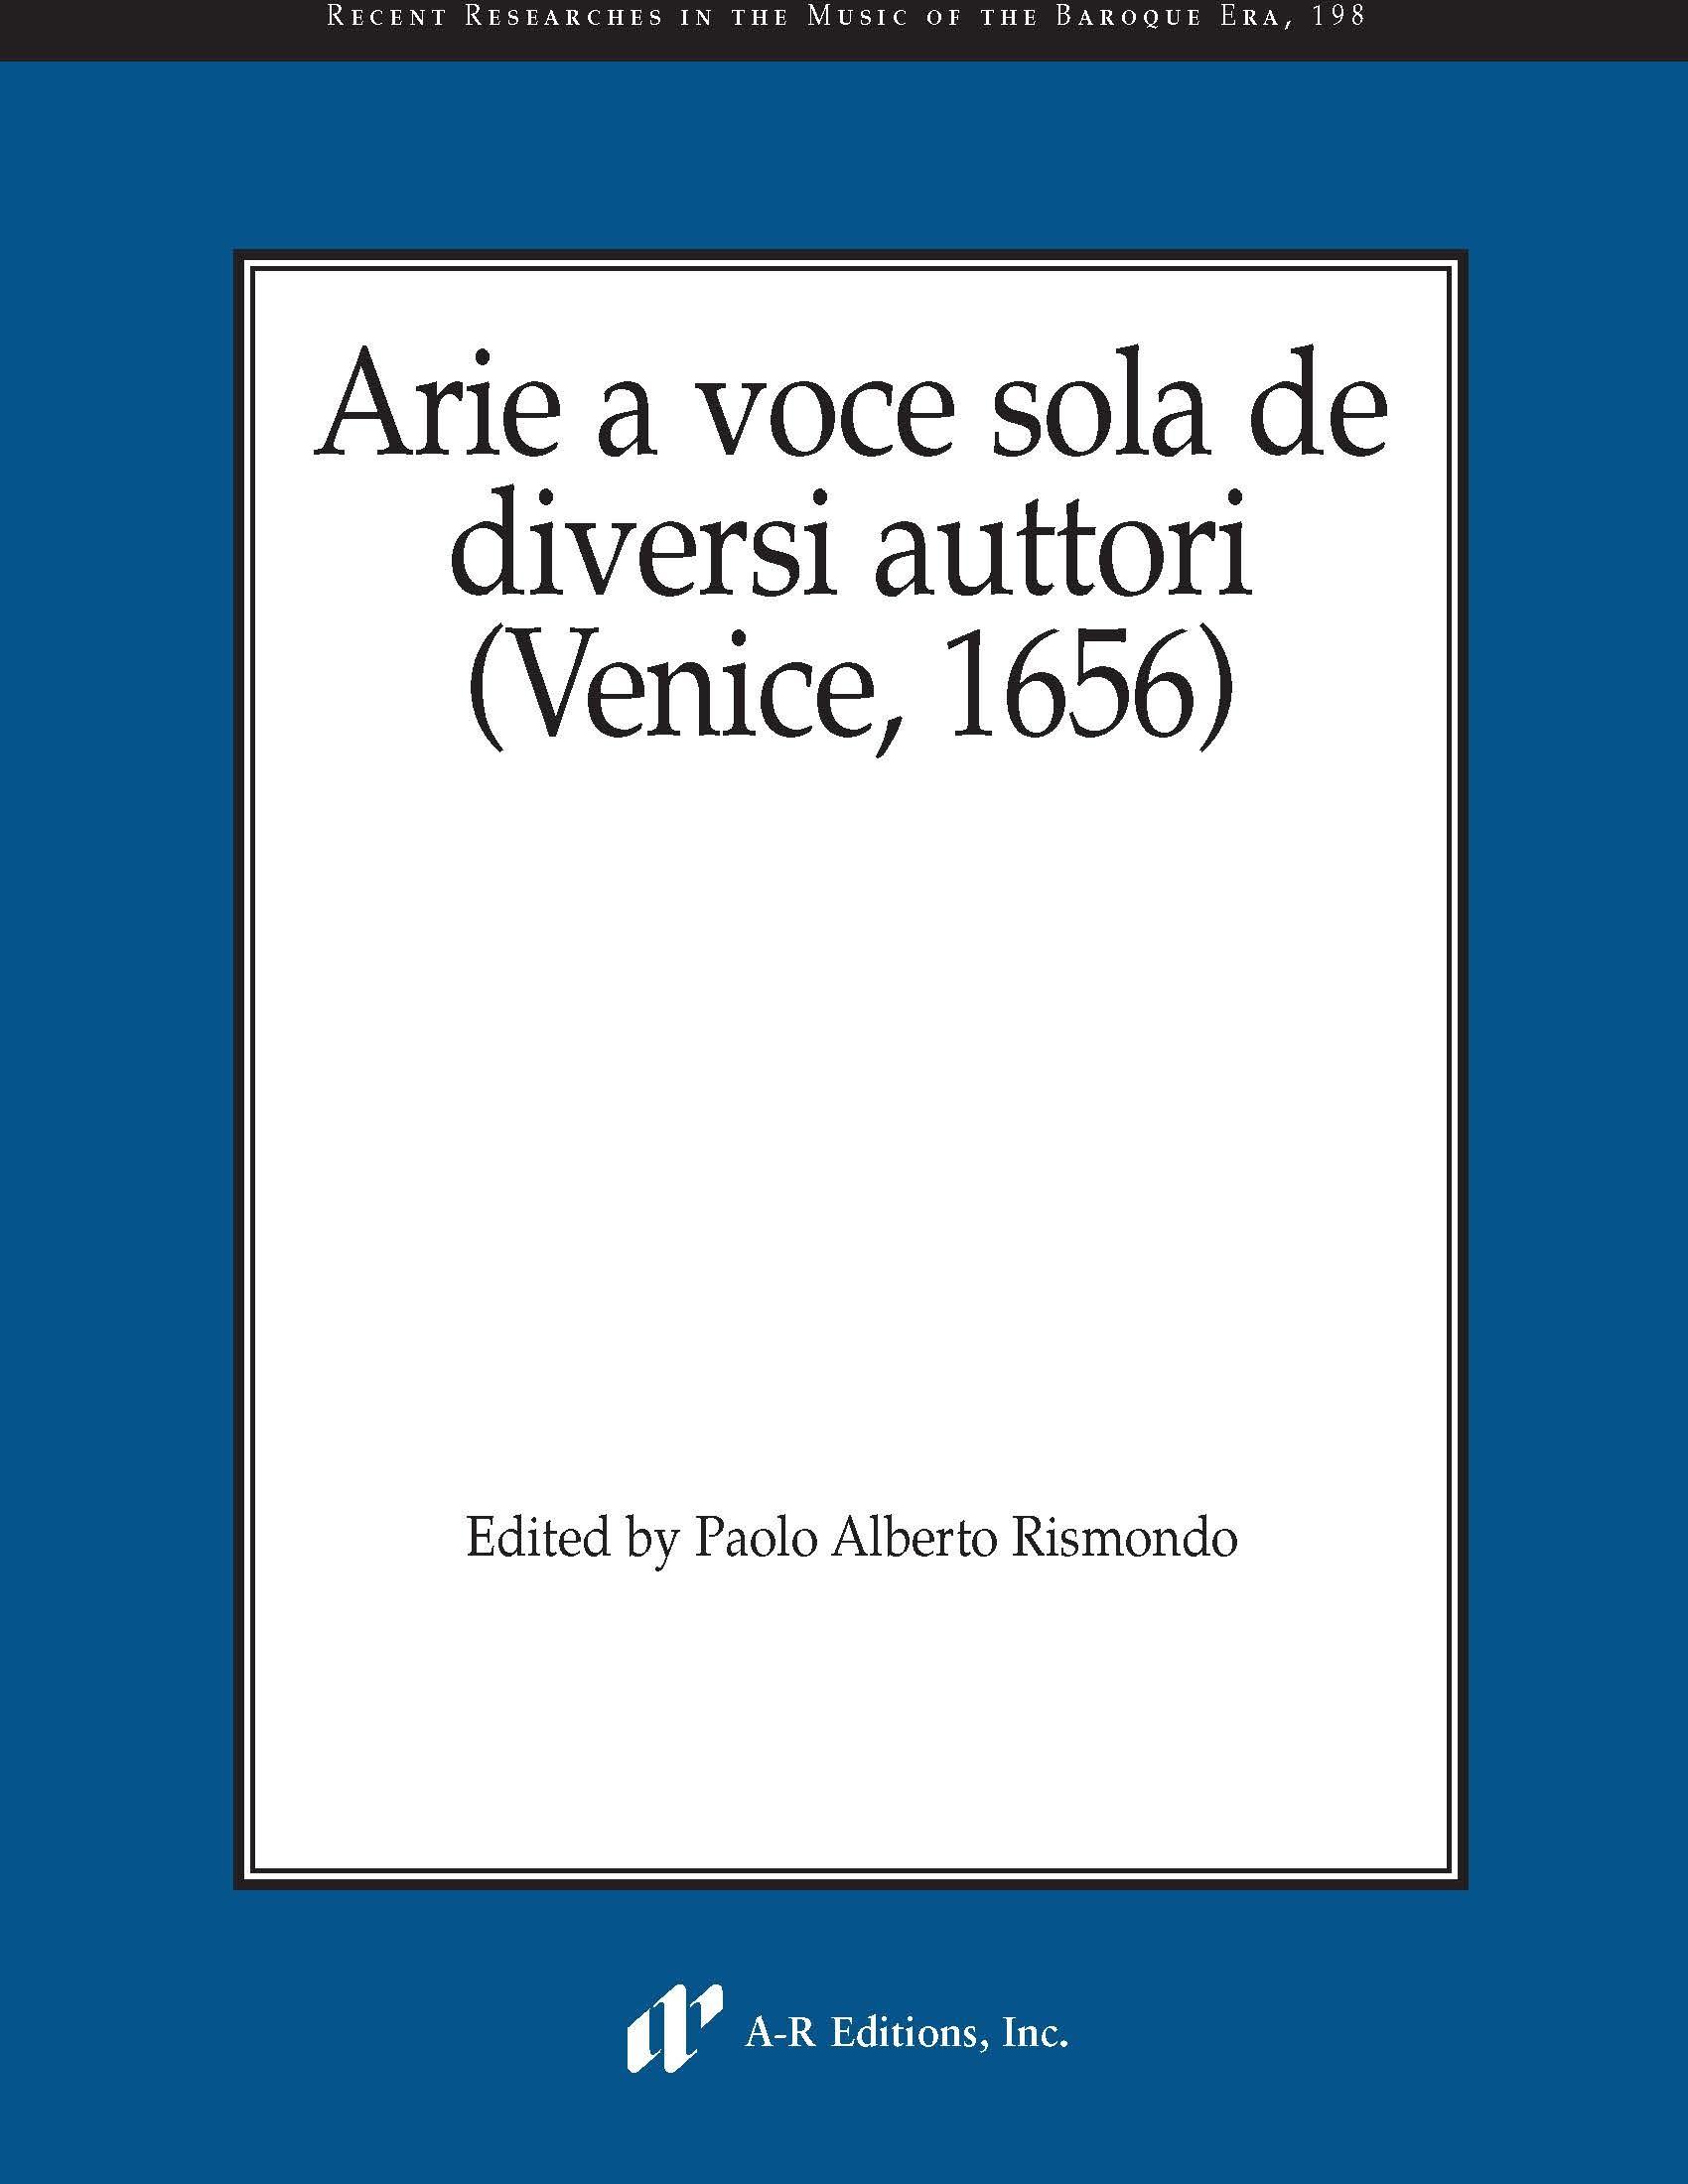 Arie a voce sola de diversi auttori (Venice, 1656)